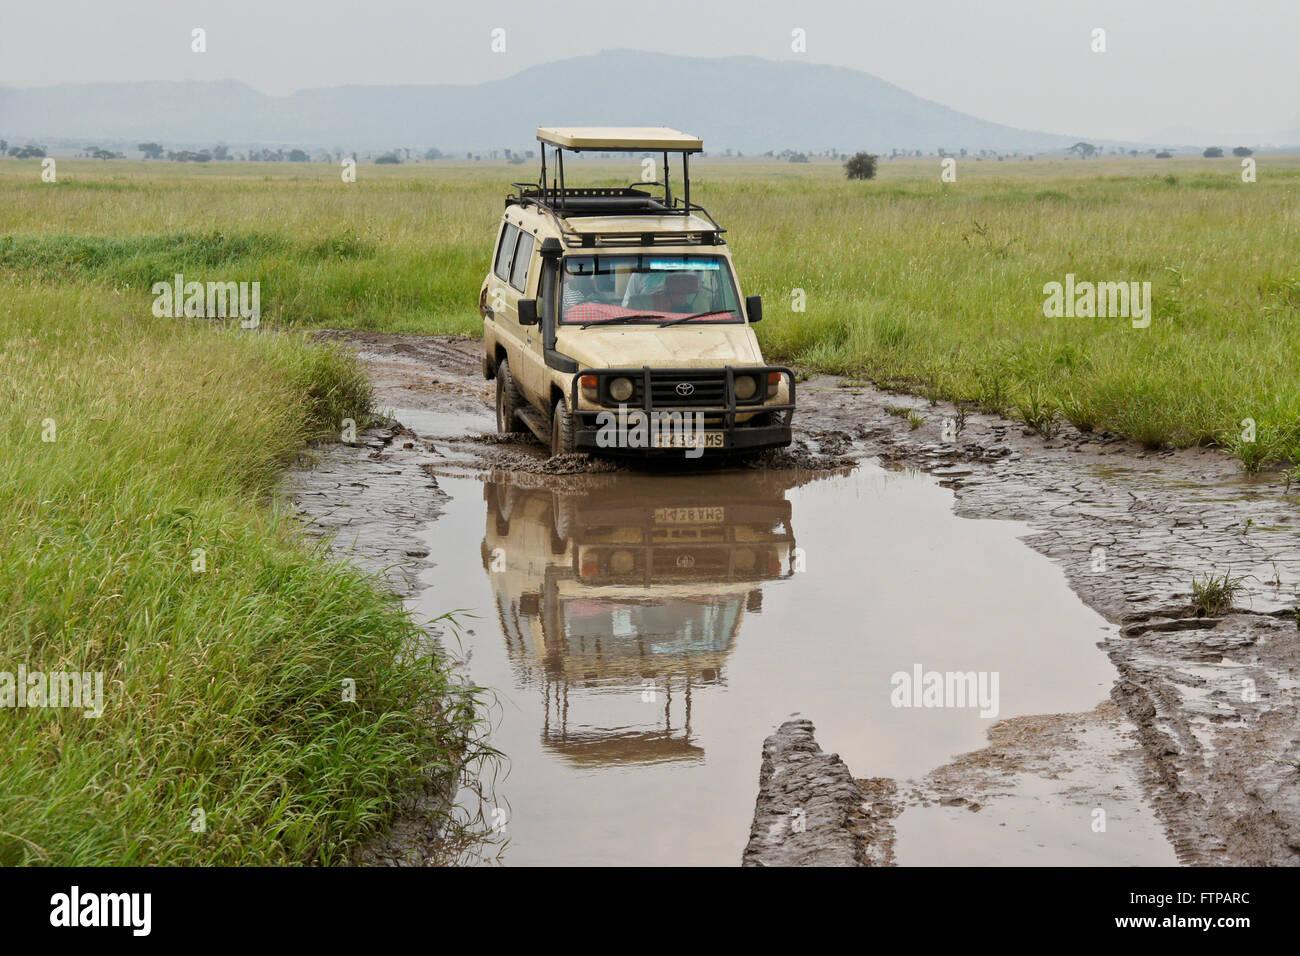 Safari vehicle driving through a mud hole on the Serengeti, Tanzania - Stock Image